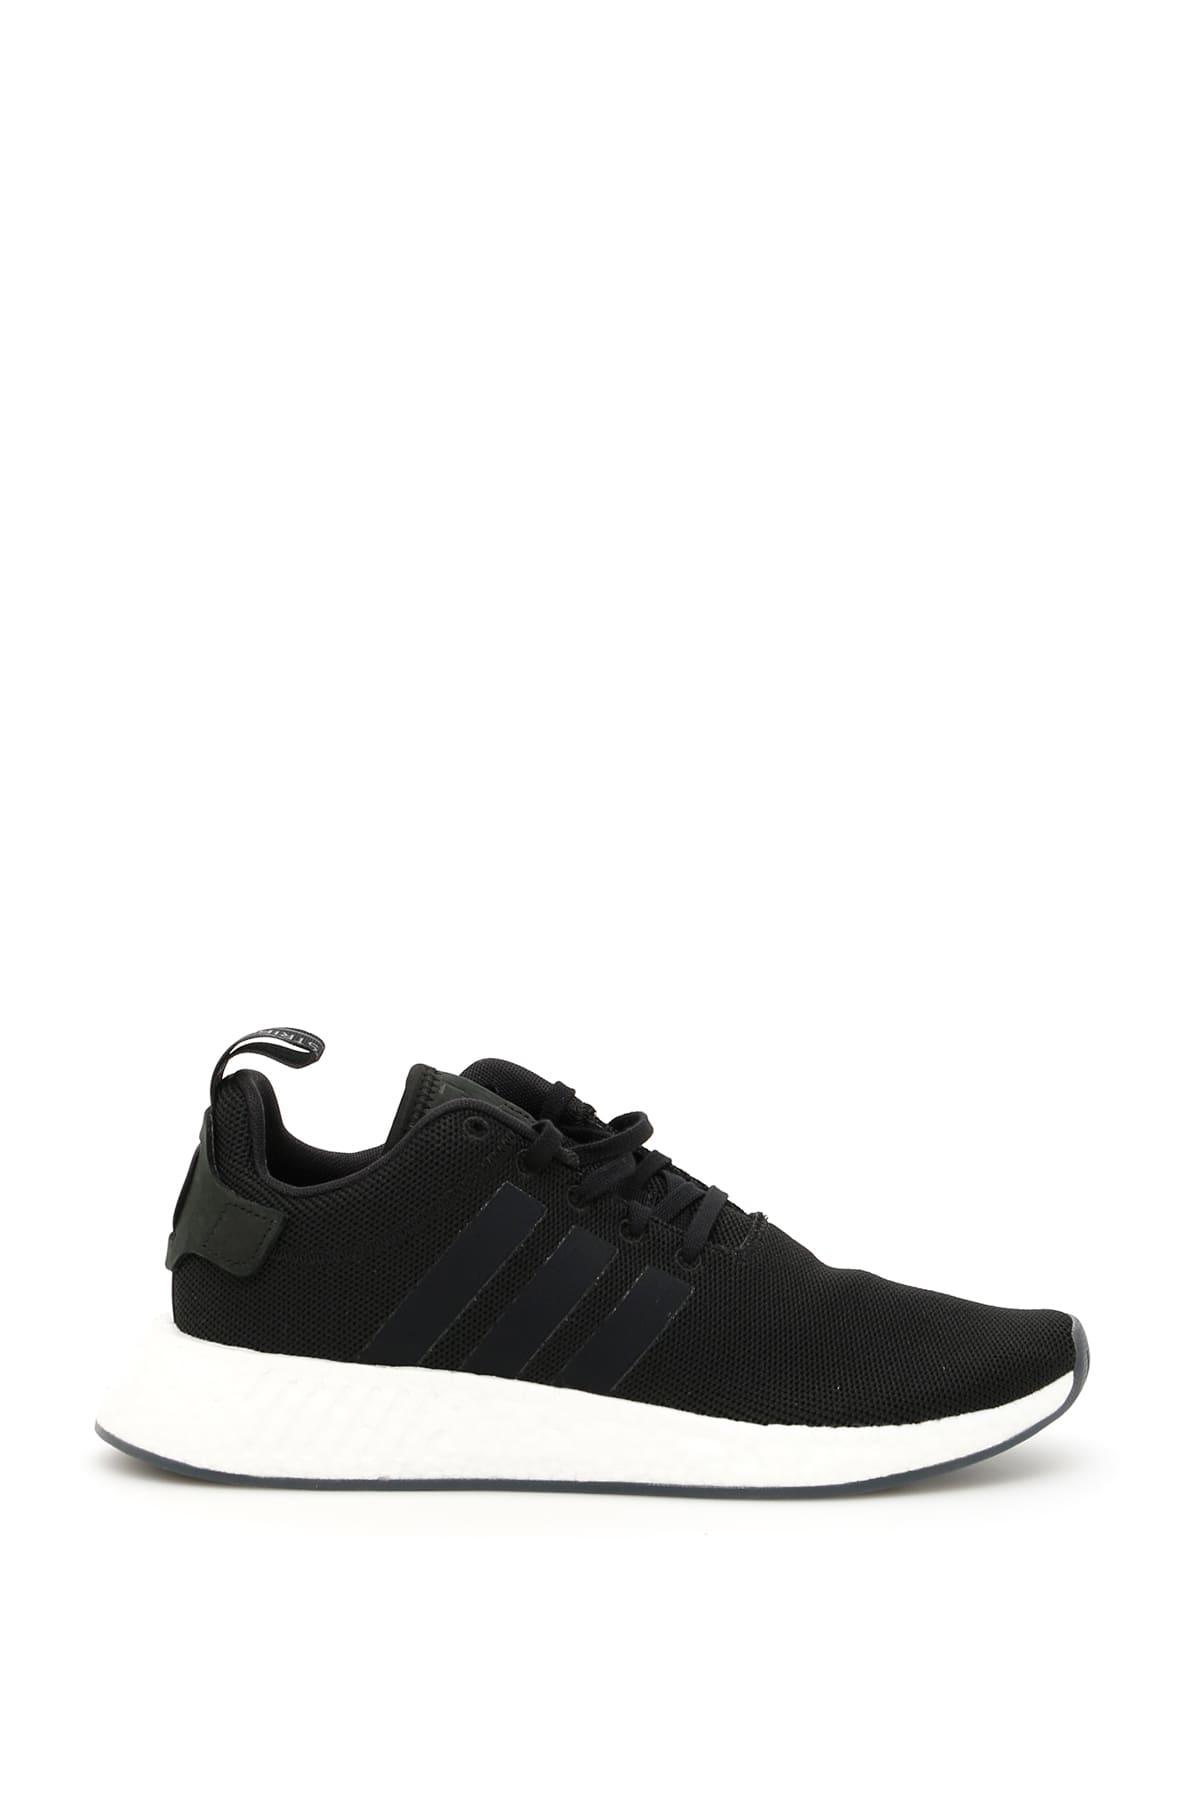 buy popular 4080b dabe0 Adidas Nmd R2 Originals Sneakers